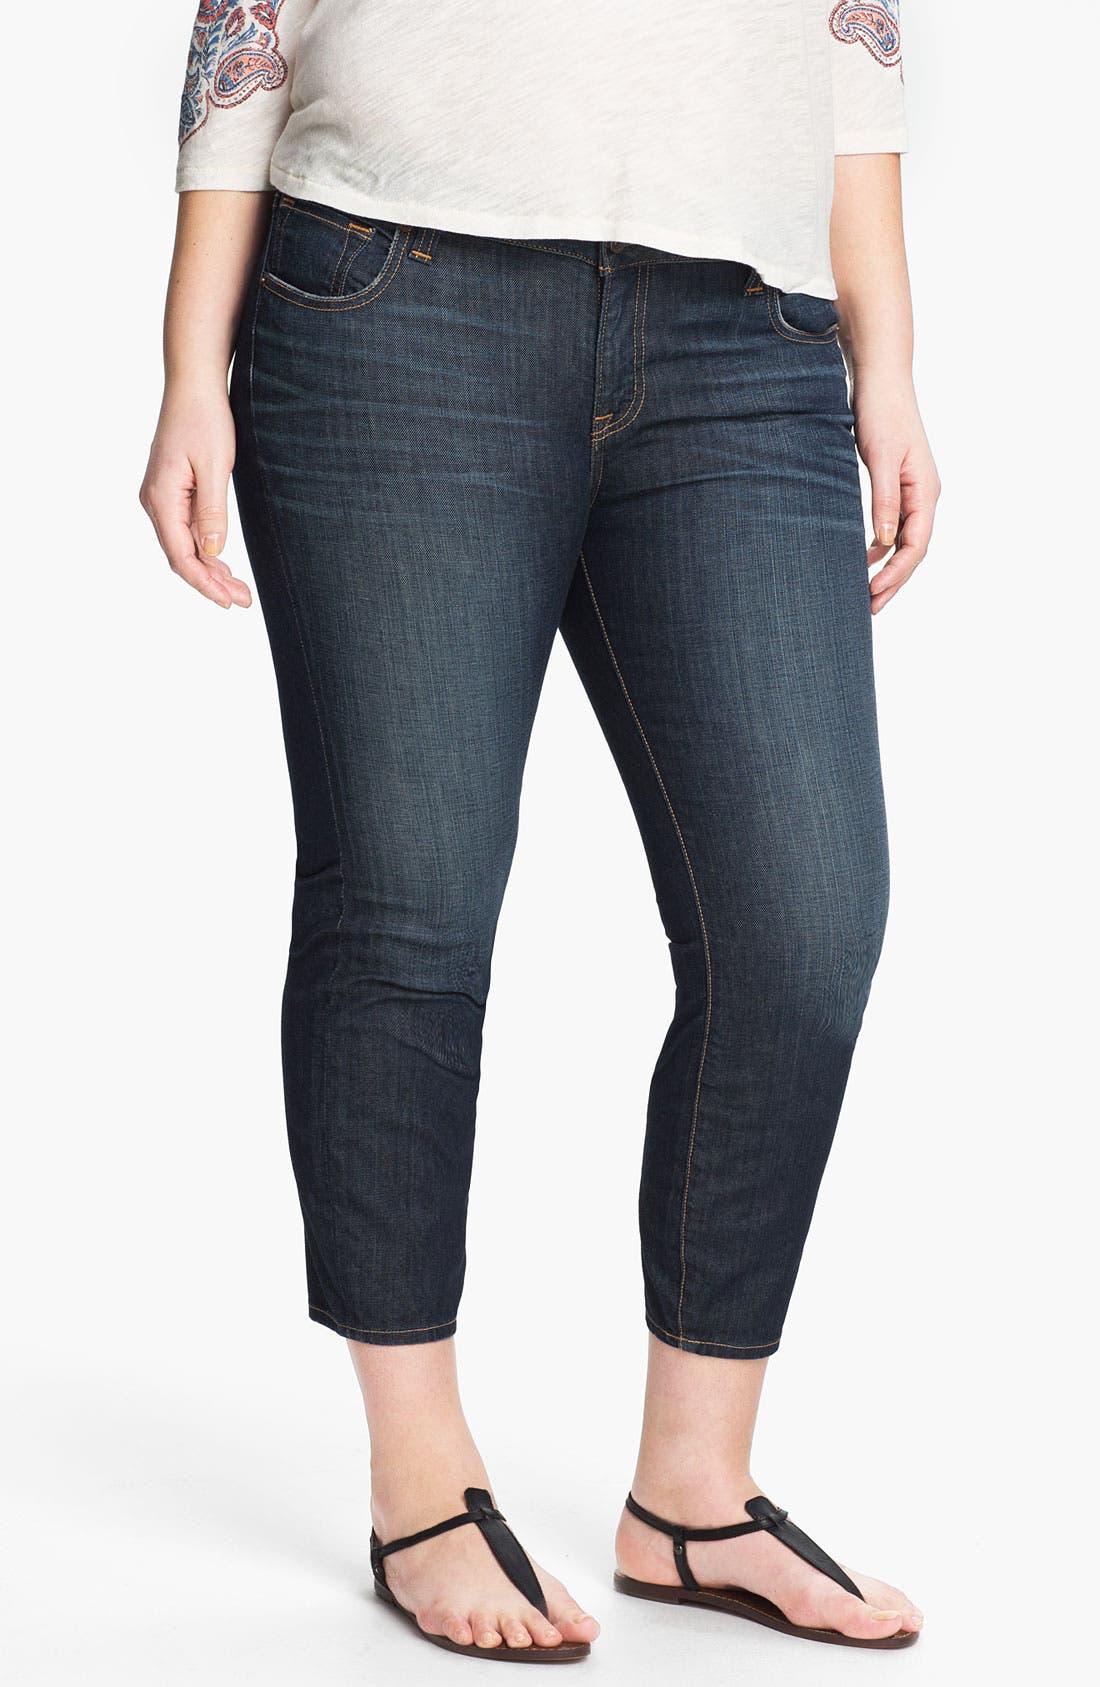 Alternate Image 1 Selected - Lucky Brand 'Ginger' Skinny Capri Jeans (Plus Size)